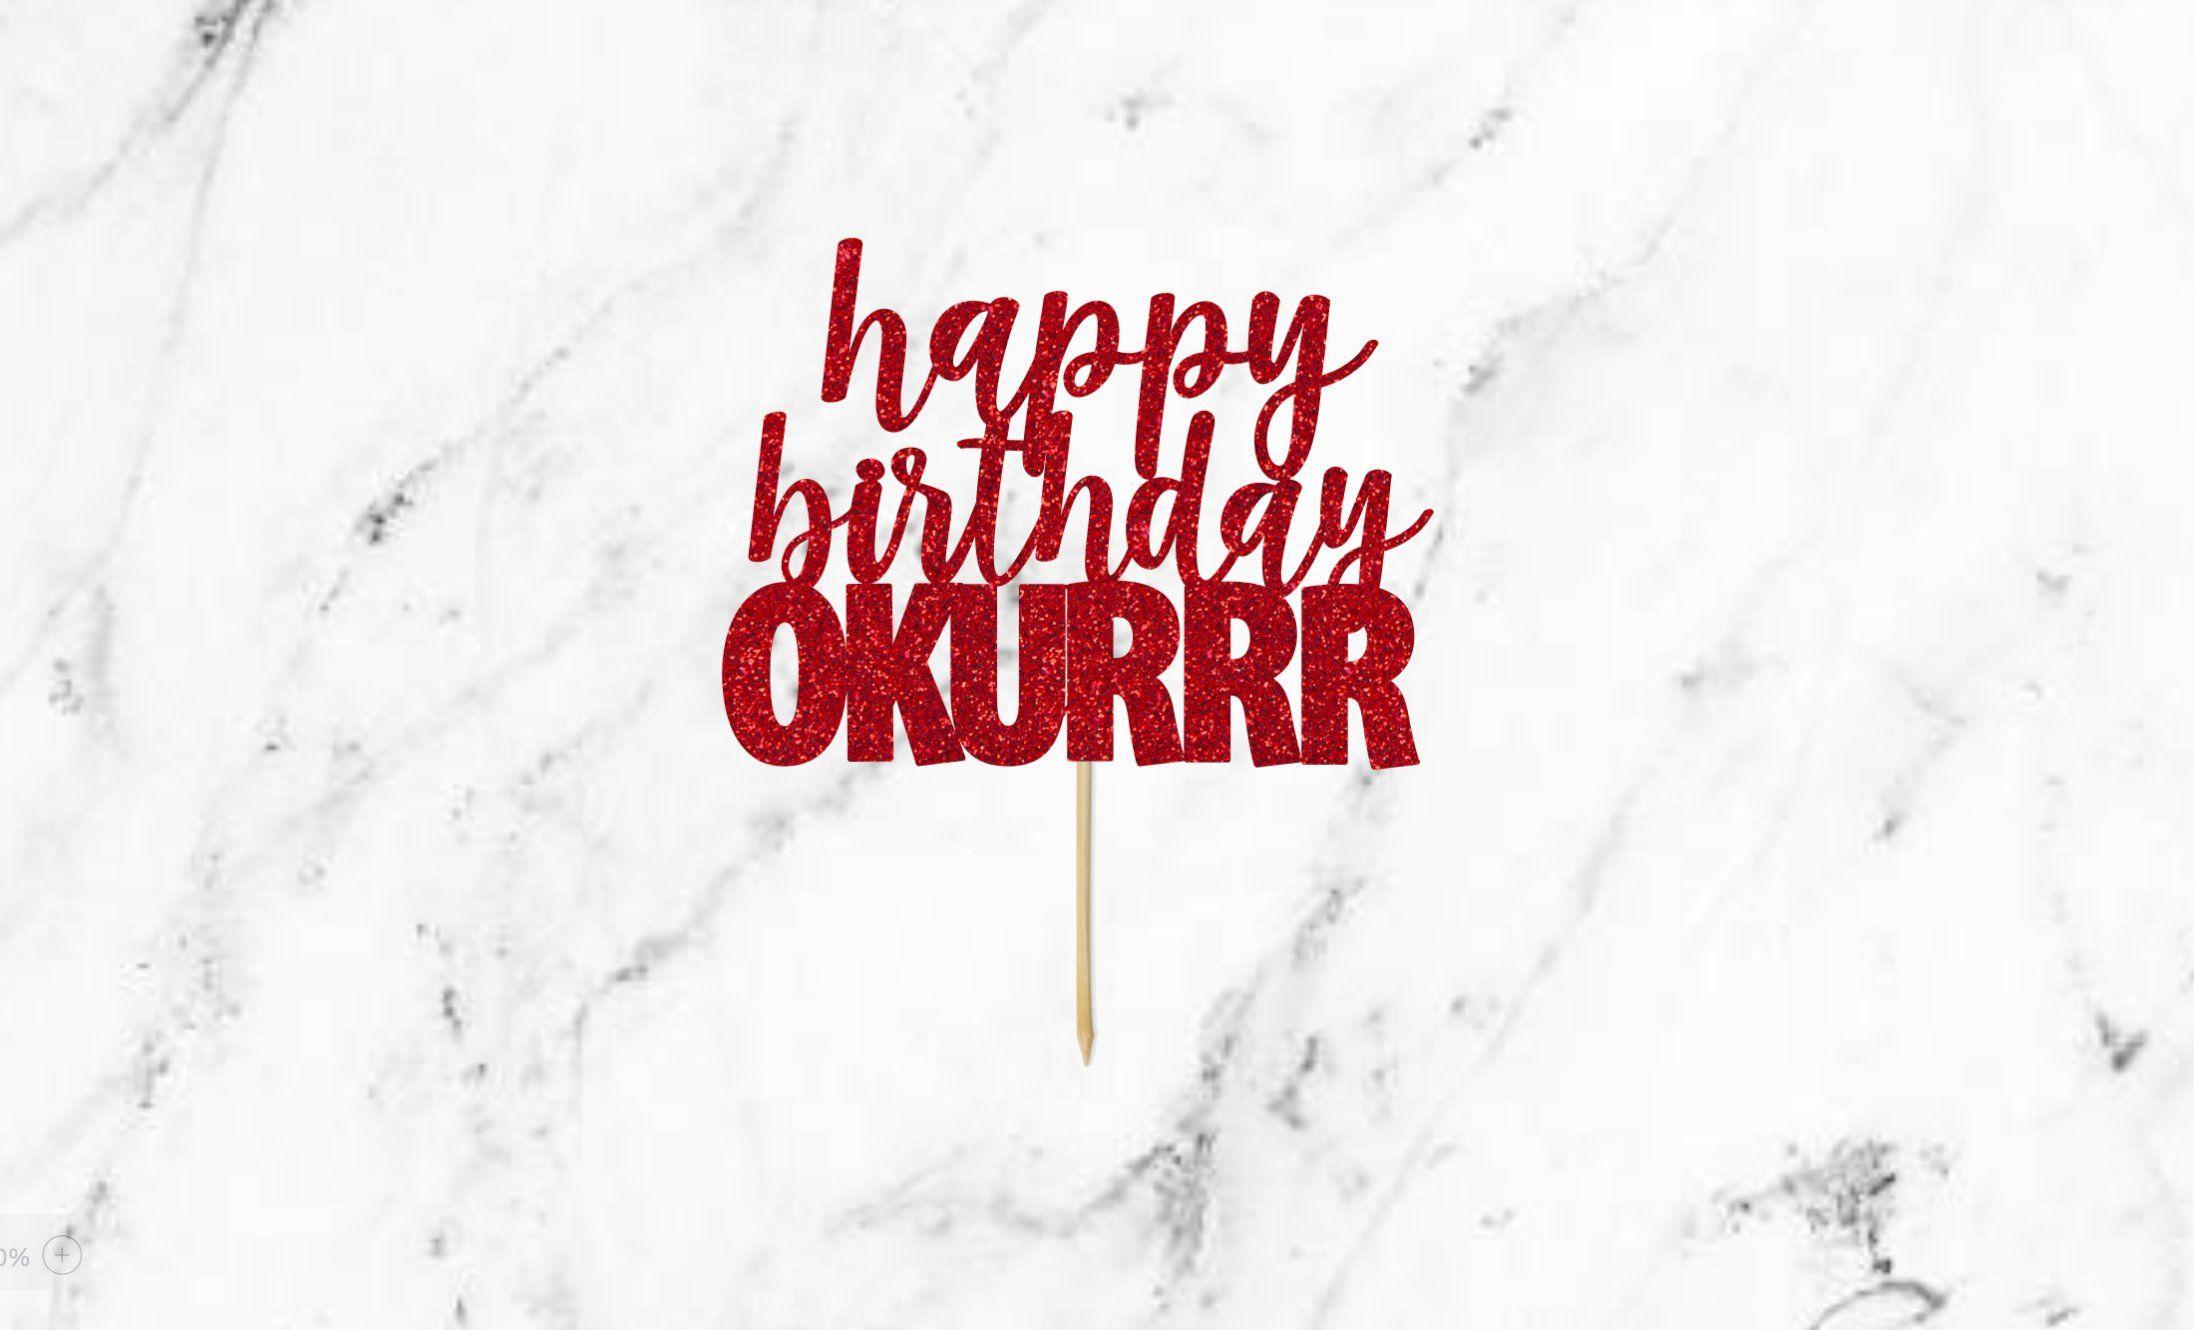 43a852673cc Happy Birthday Okurrr Cake Topper Cardi B Cake Topper Okurrrr Okurrr Cake  Topper Birthday Cake Topper Cardi B Decoration Cardi B Party Cardi